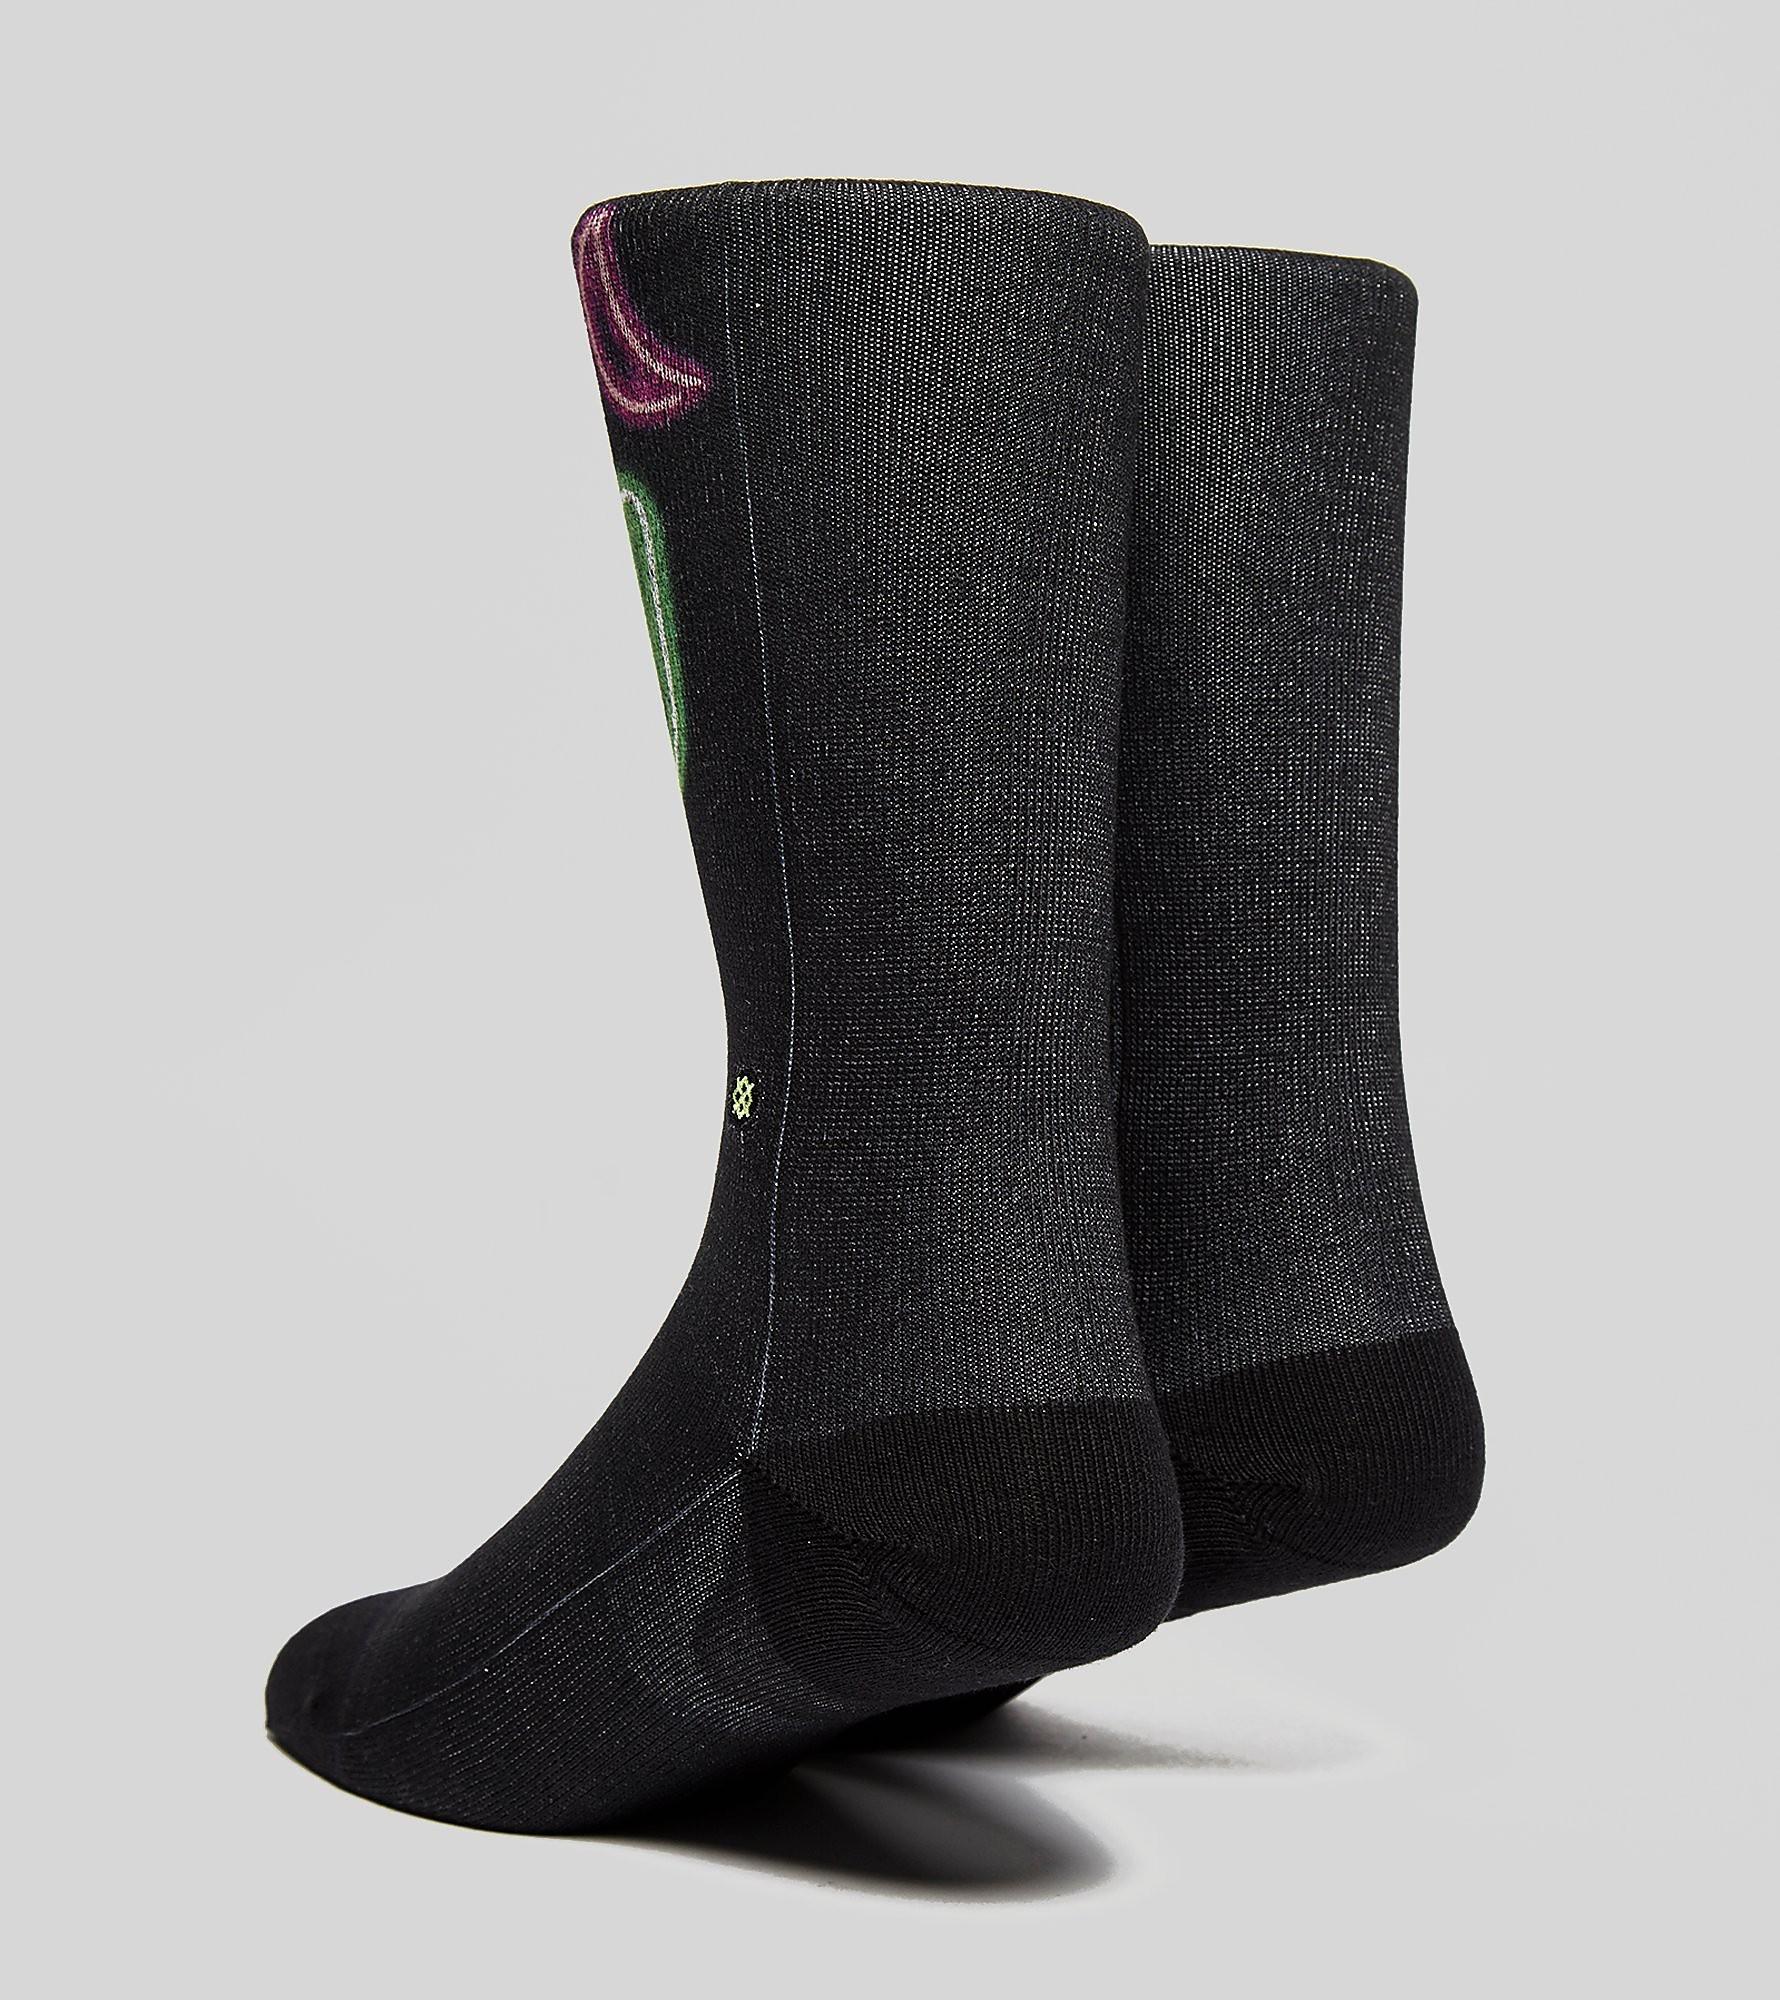 Stance Night Light Ankle Sock Women's